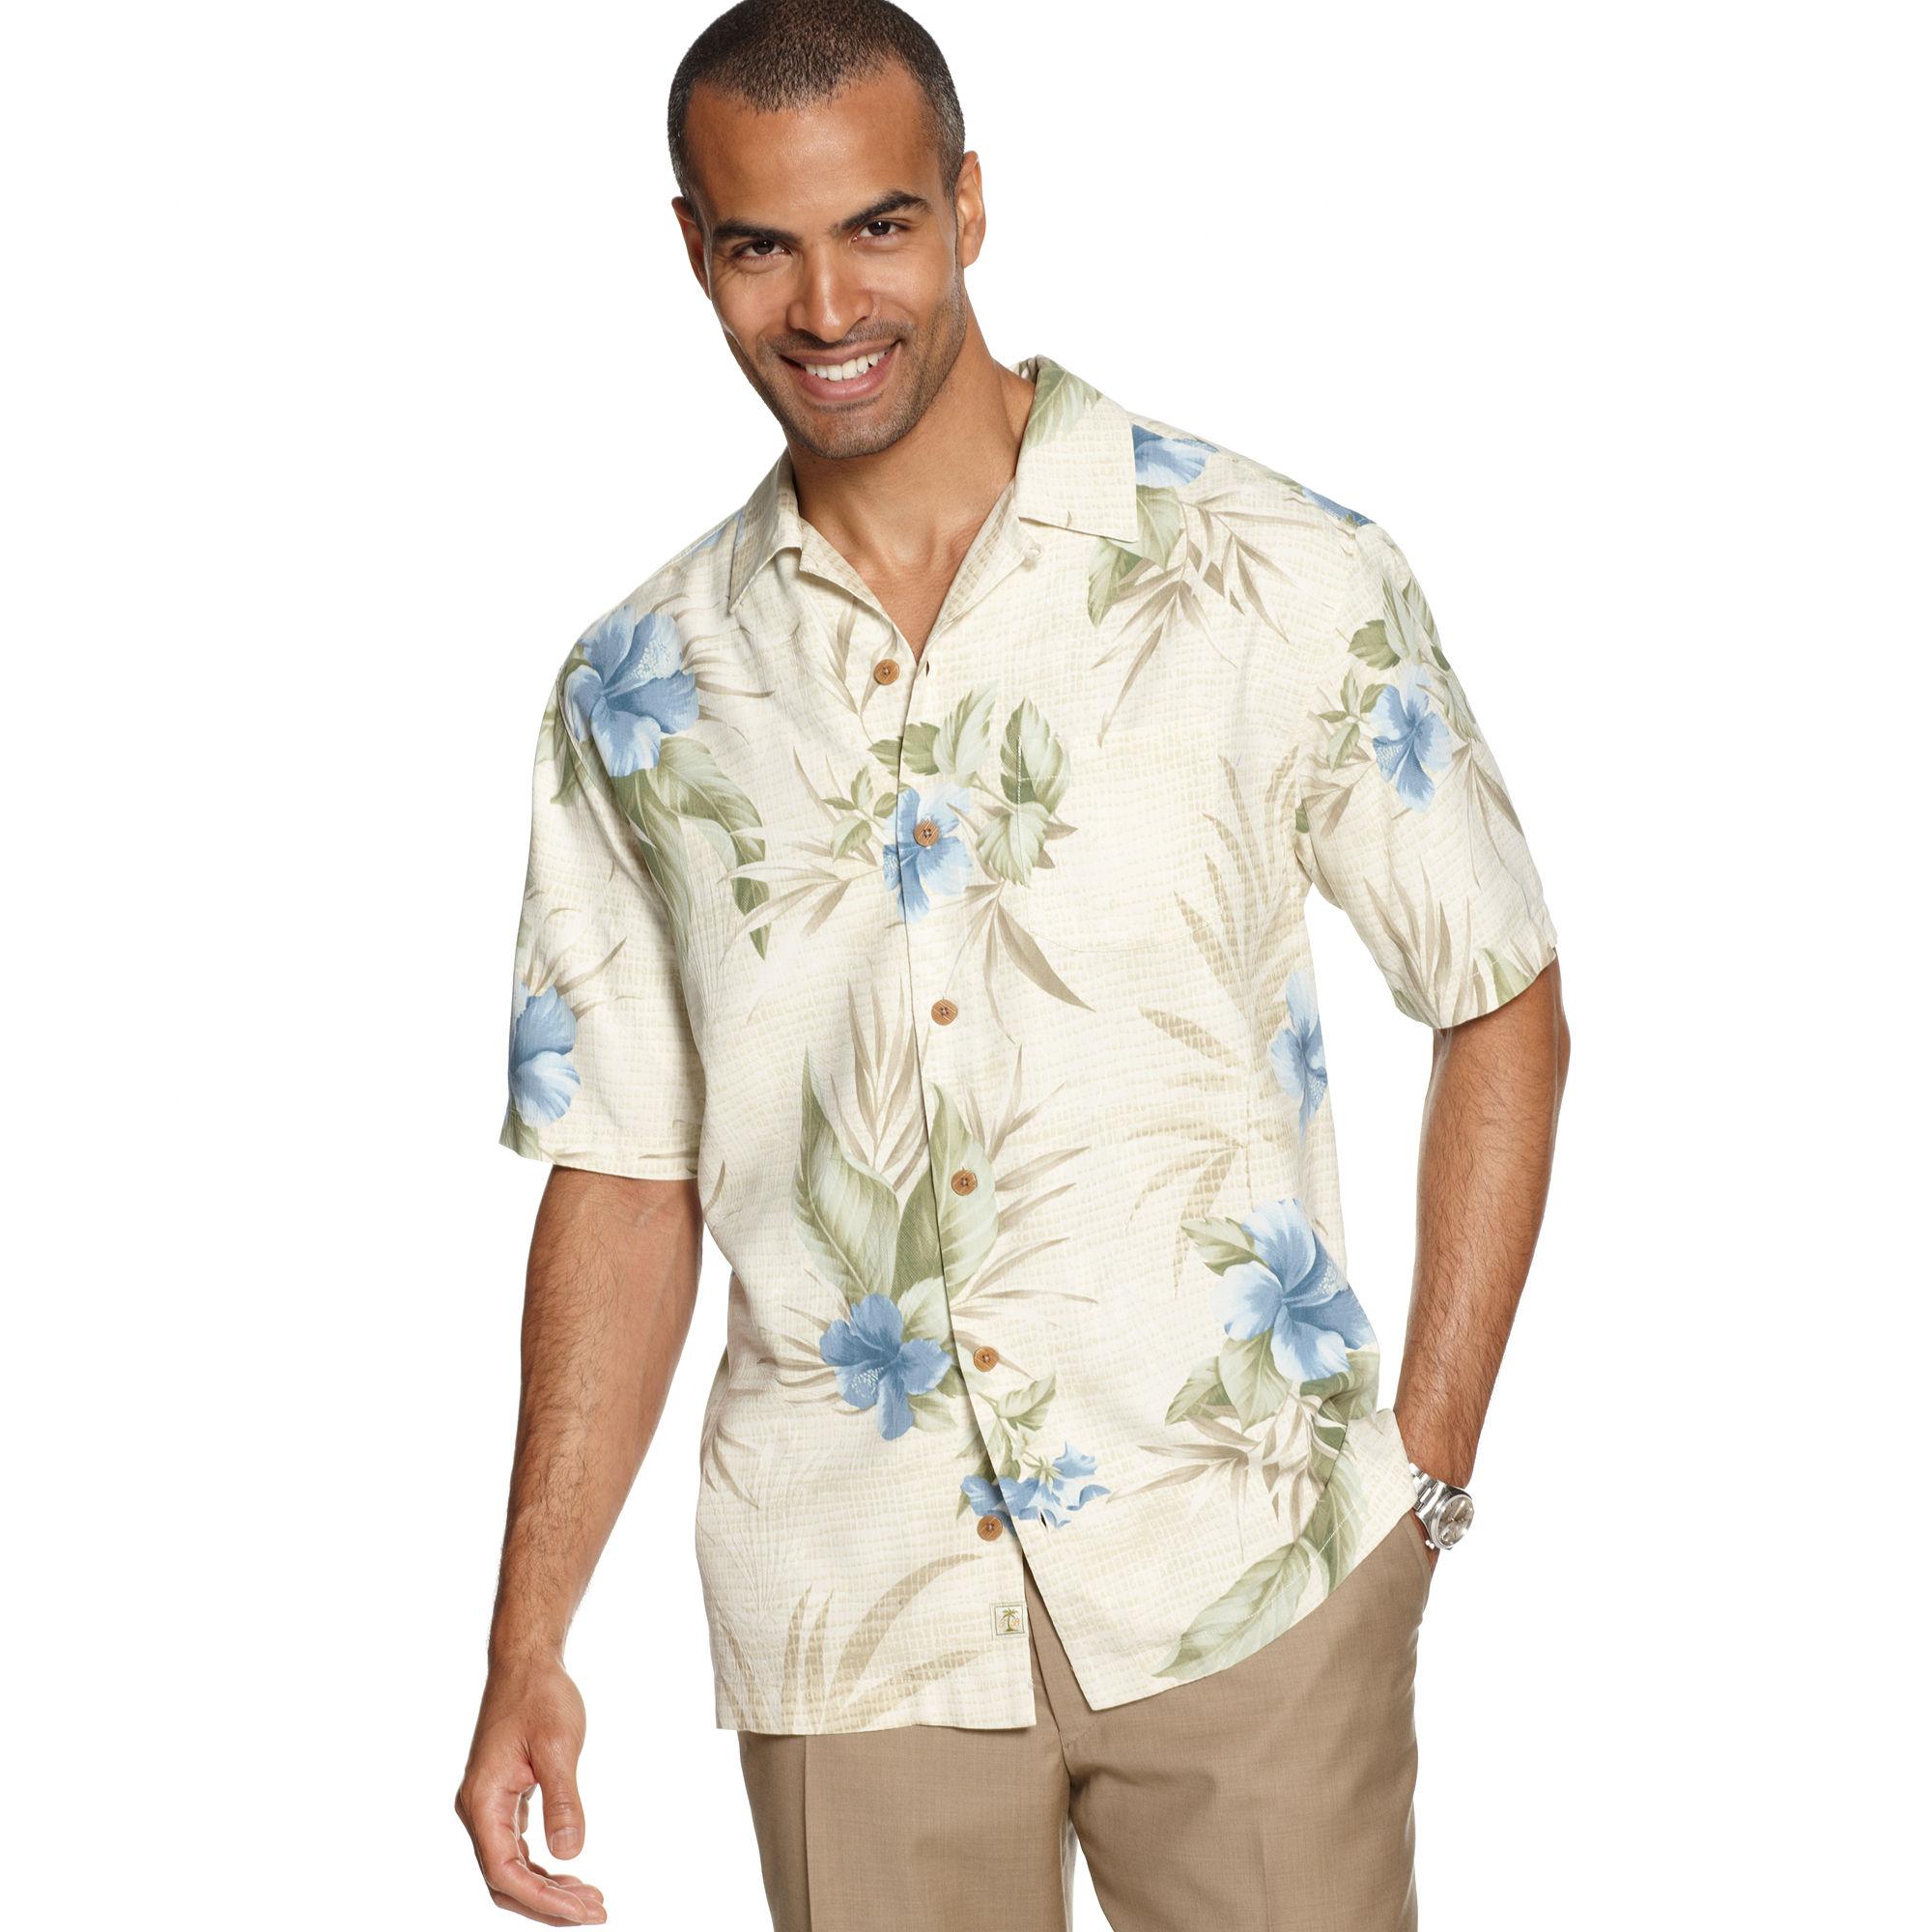 Lyst tommy bahama tropical mosaic short sleeve shirt in for Tommy bahama florida shirt